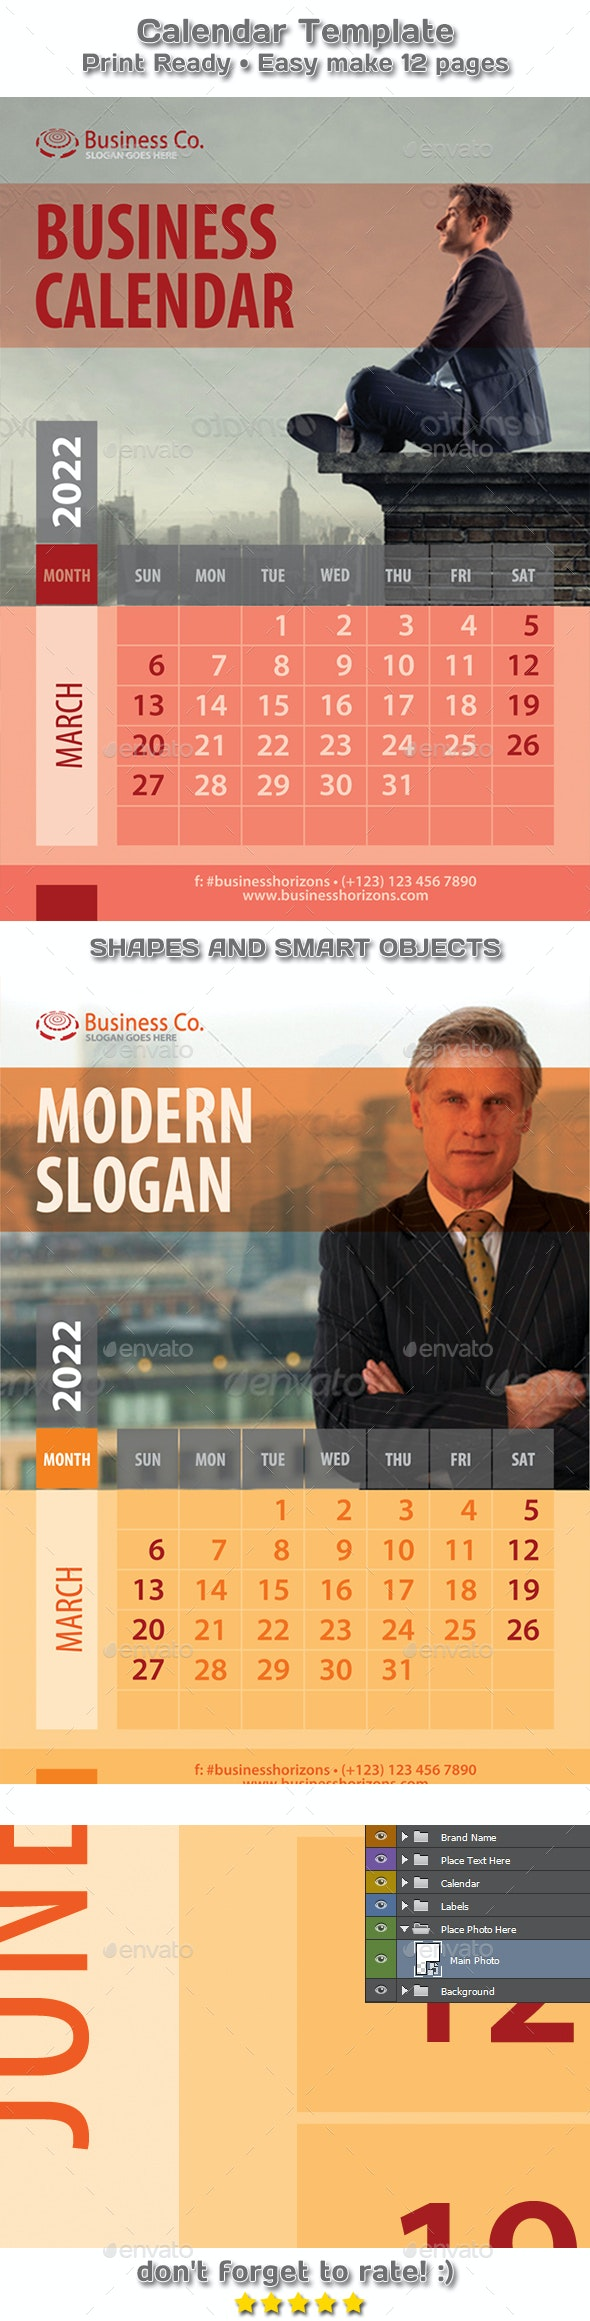 Modern Business Two Styles Calendar 2021 - 2022 Template - Calendars Stationery